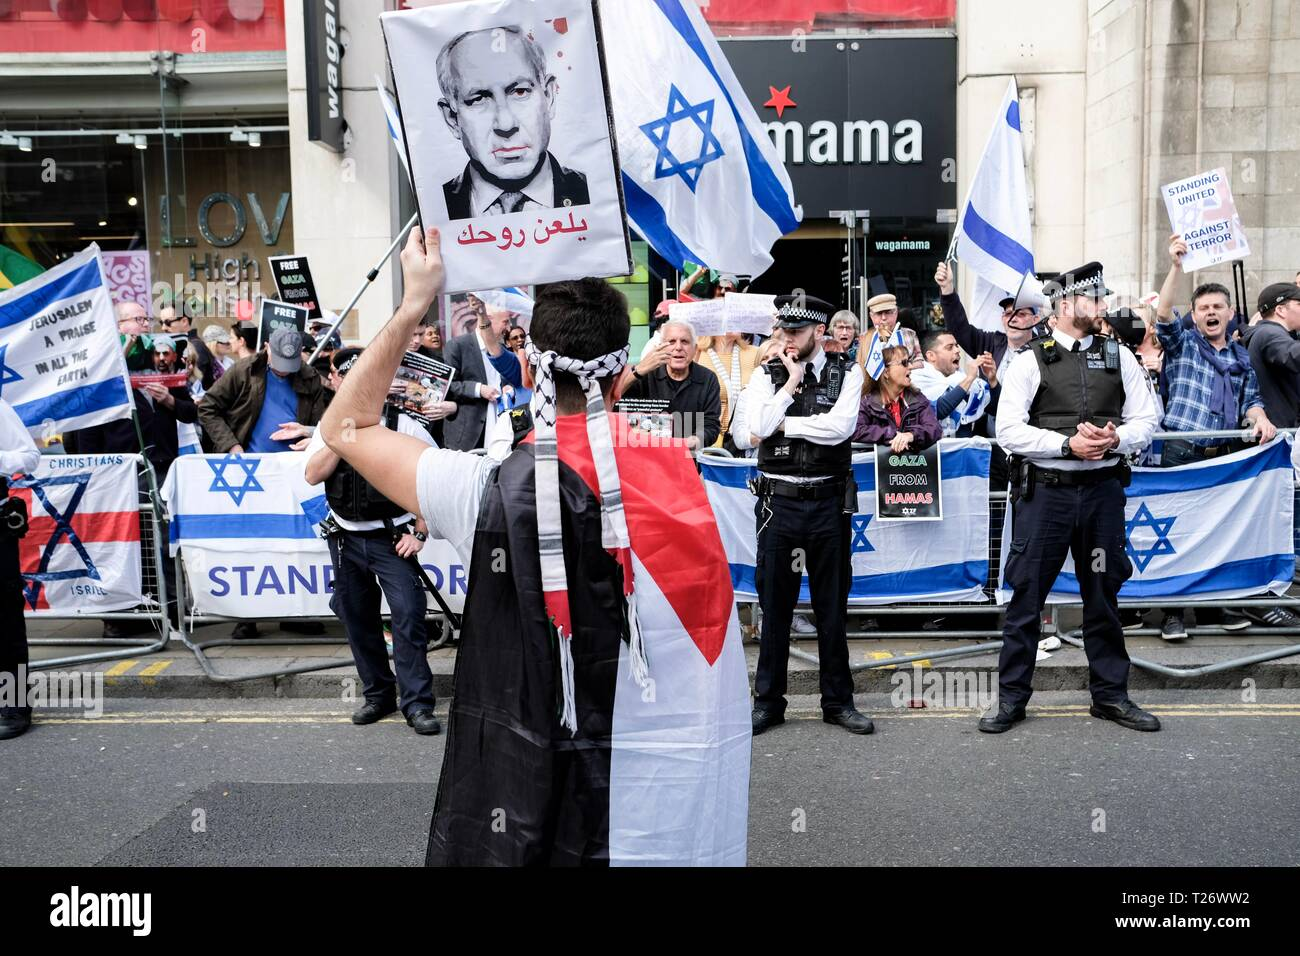 London, United Kingdom. 30th March 2019. Rally for Palestine in London United Kingdom, 30th March 2019 Credit: Rokas Juozapavicius/Alamy Live News - Stock Image